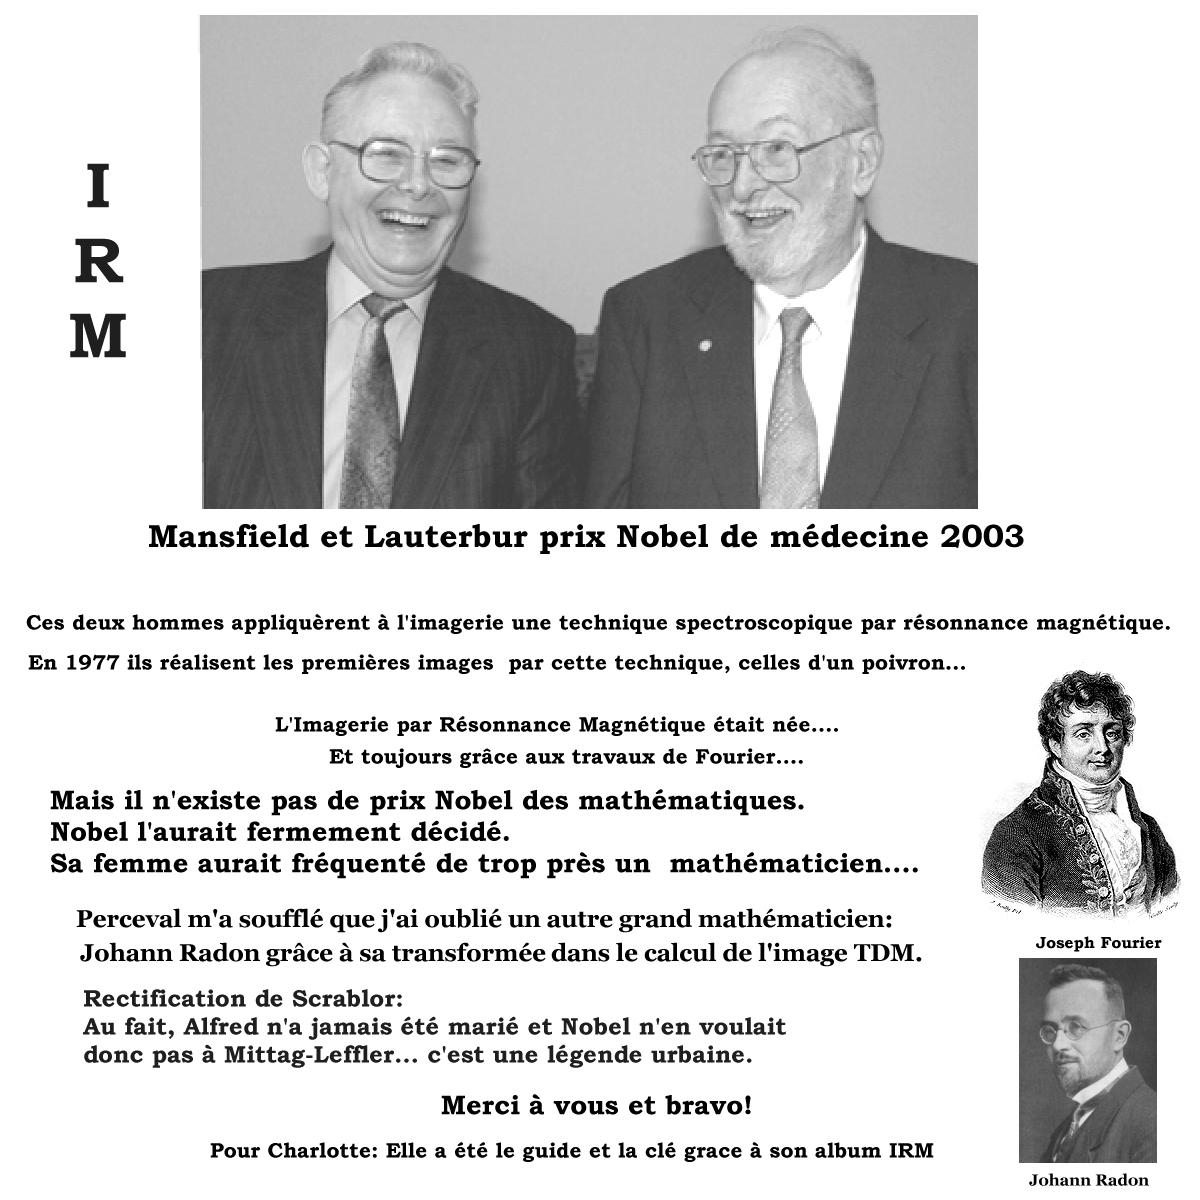 http://www.prise2tete.fr/upload/papyricko-lauterburmansfield.jpg